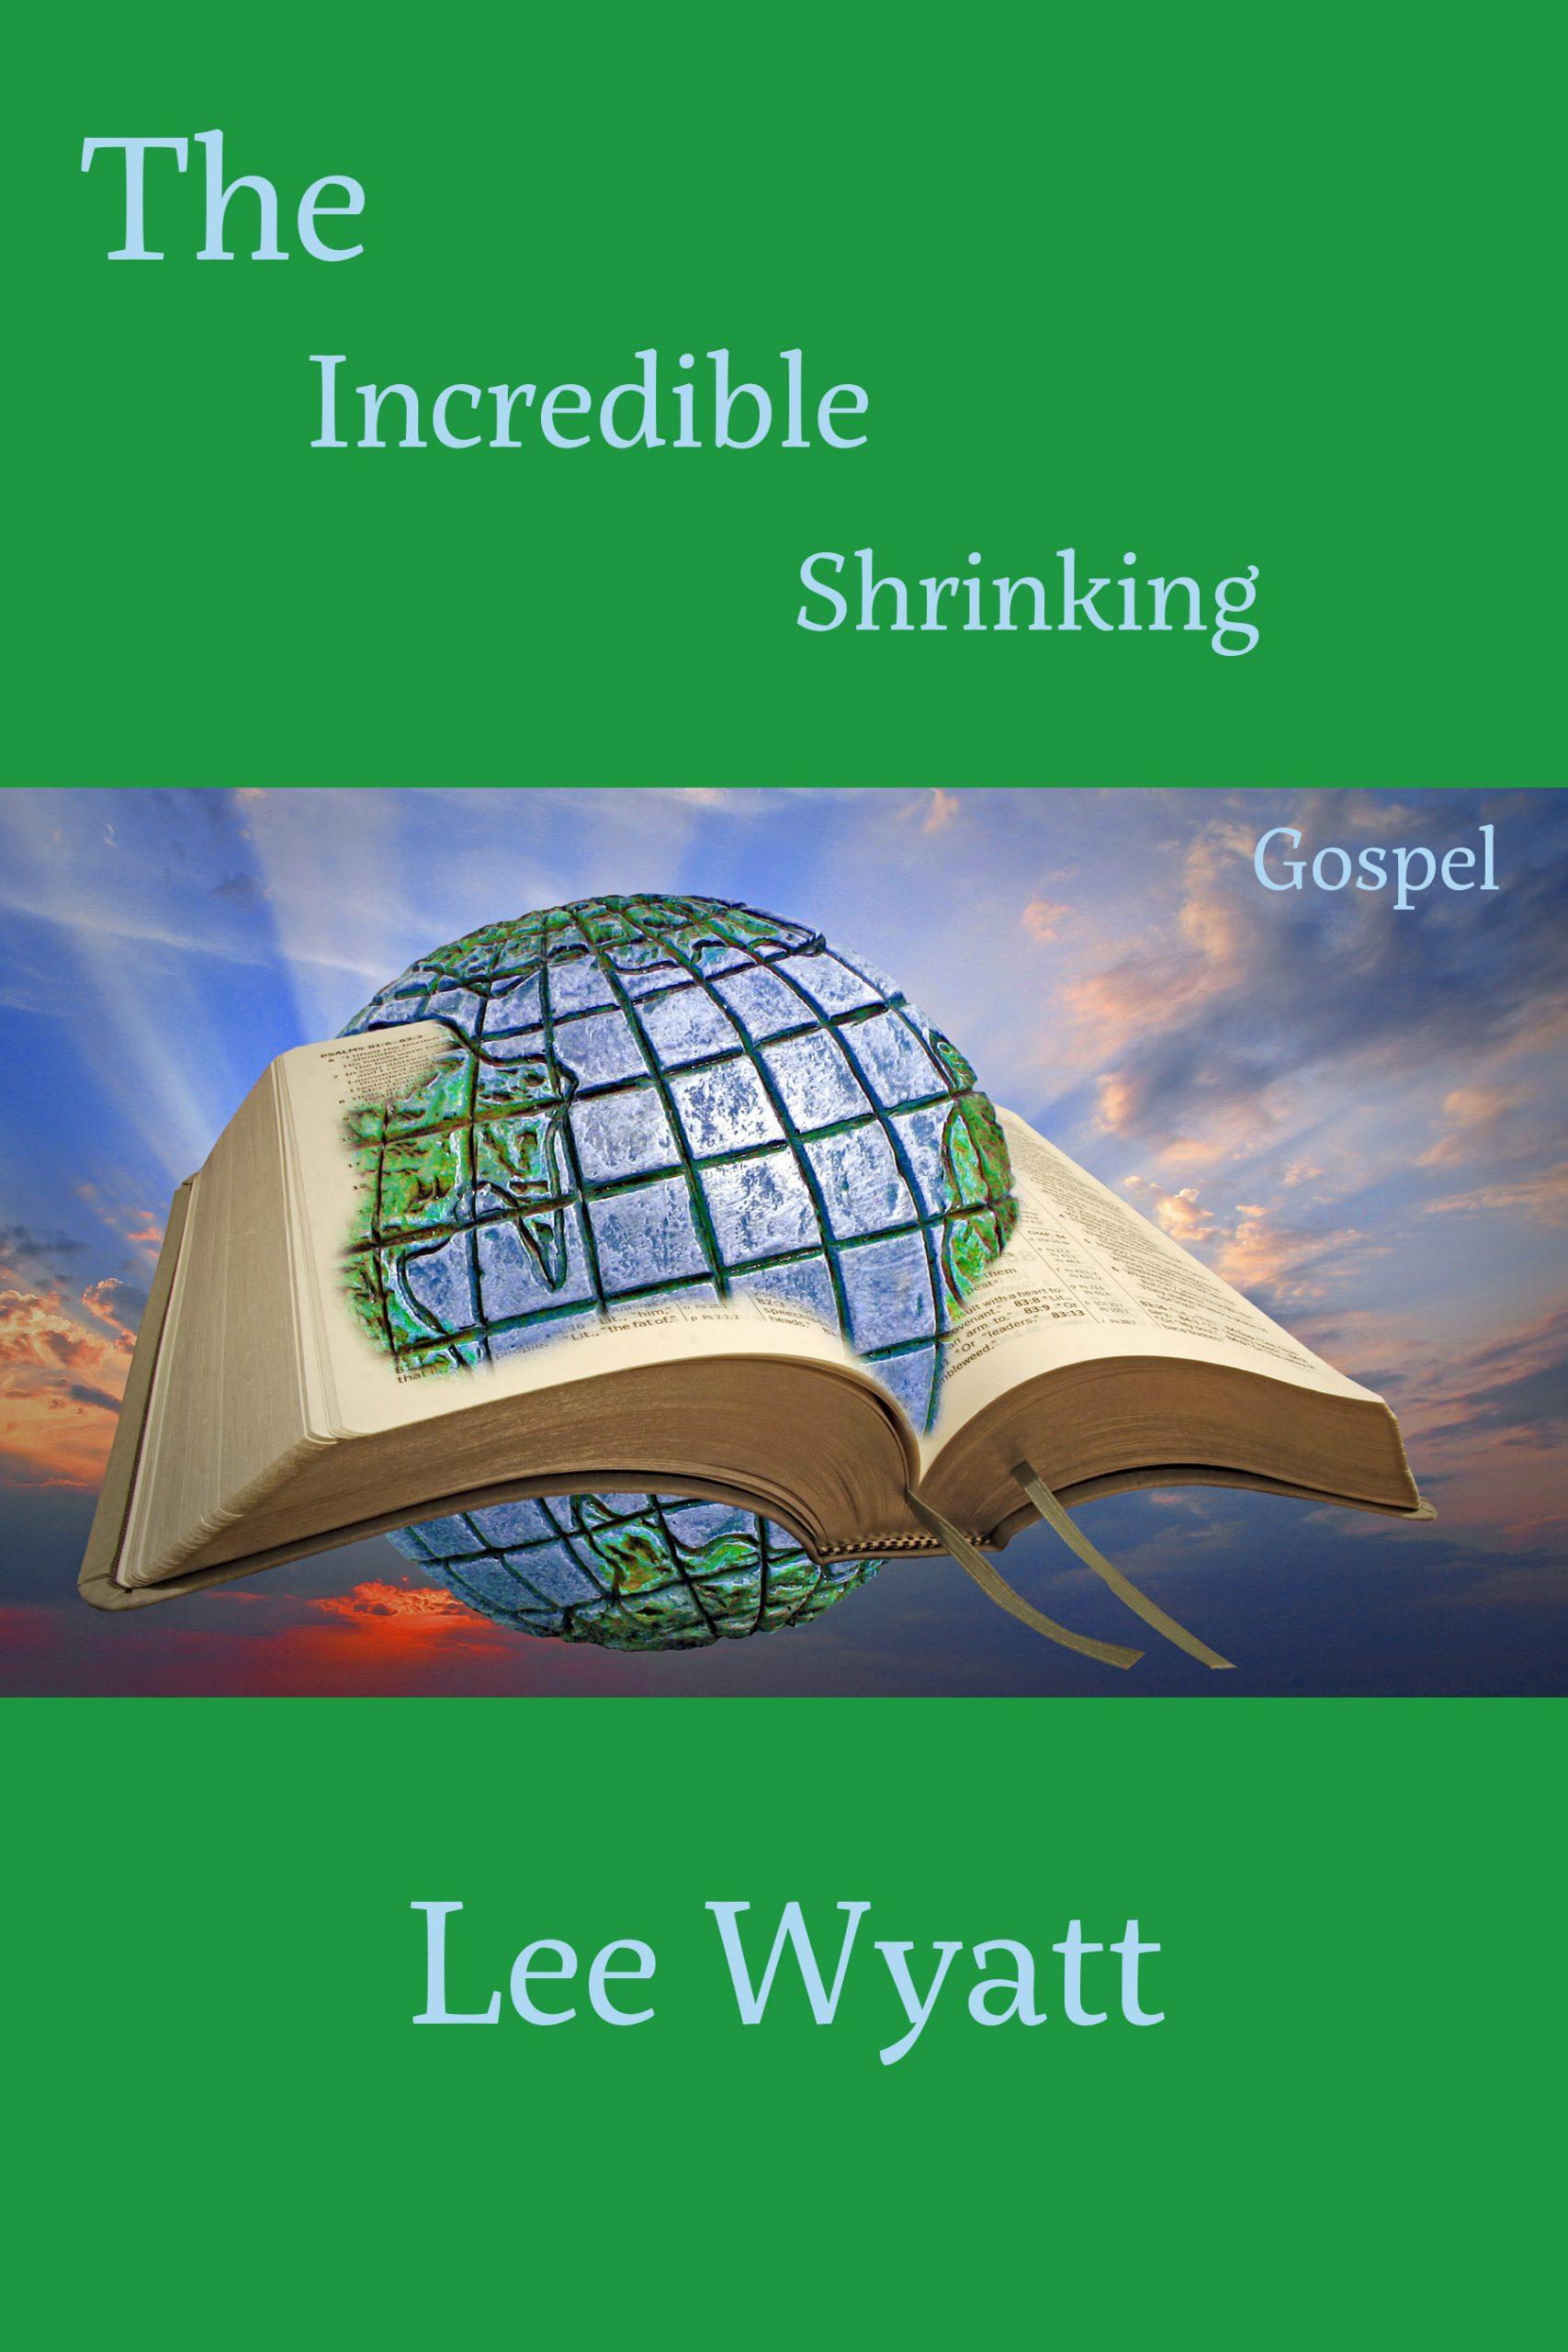 The Incredible Shrinking Gospel